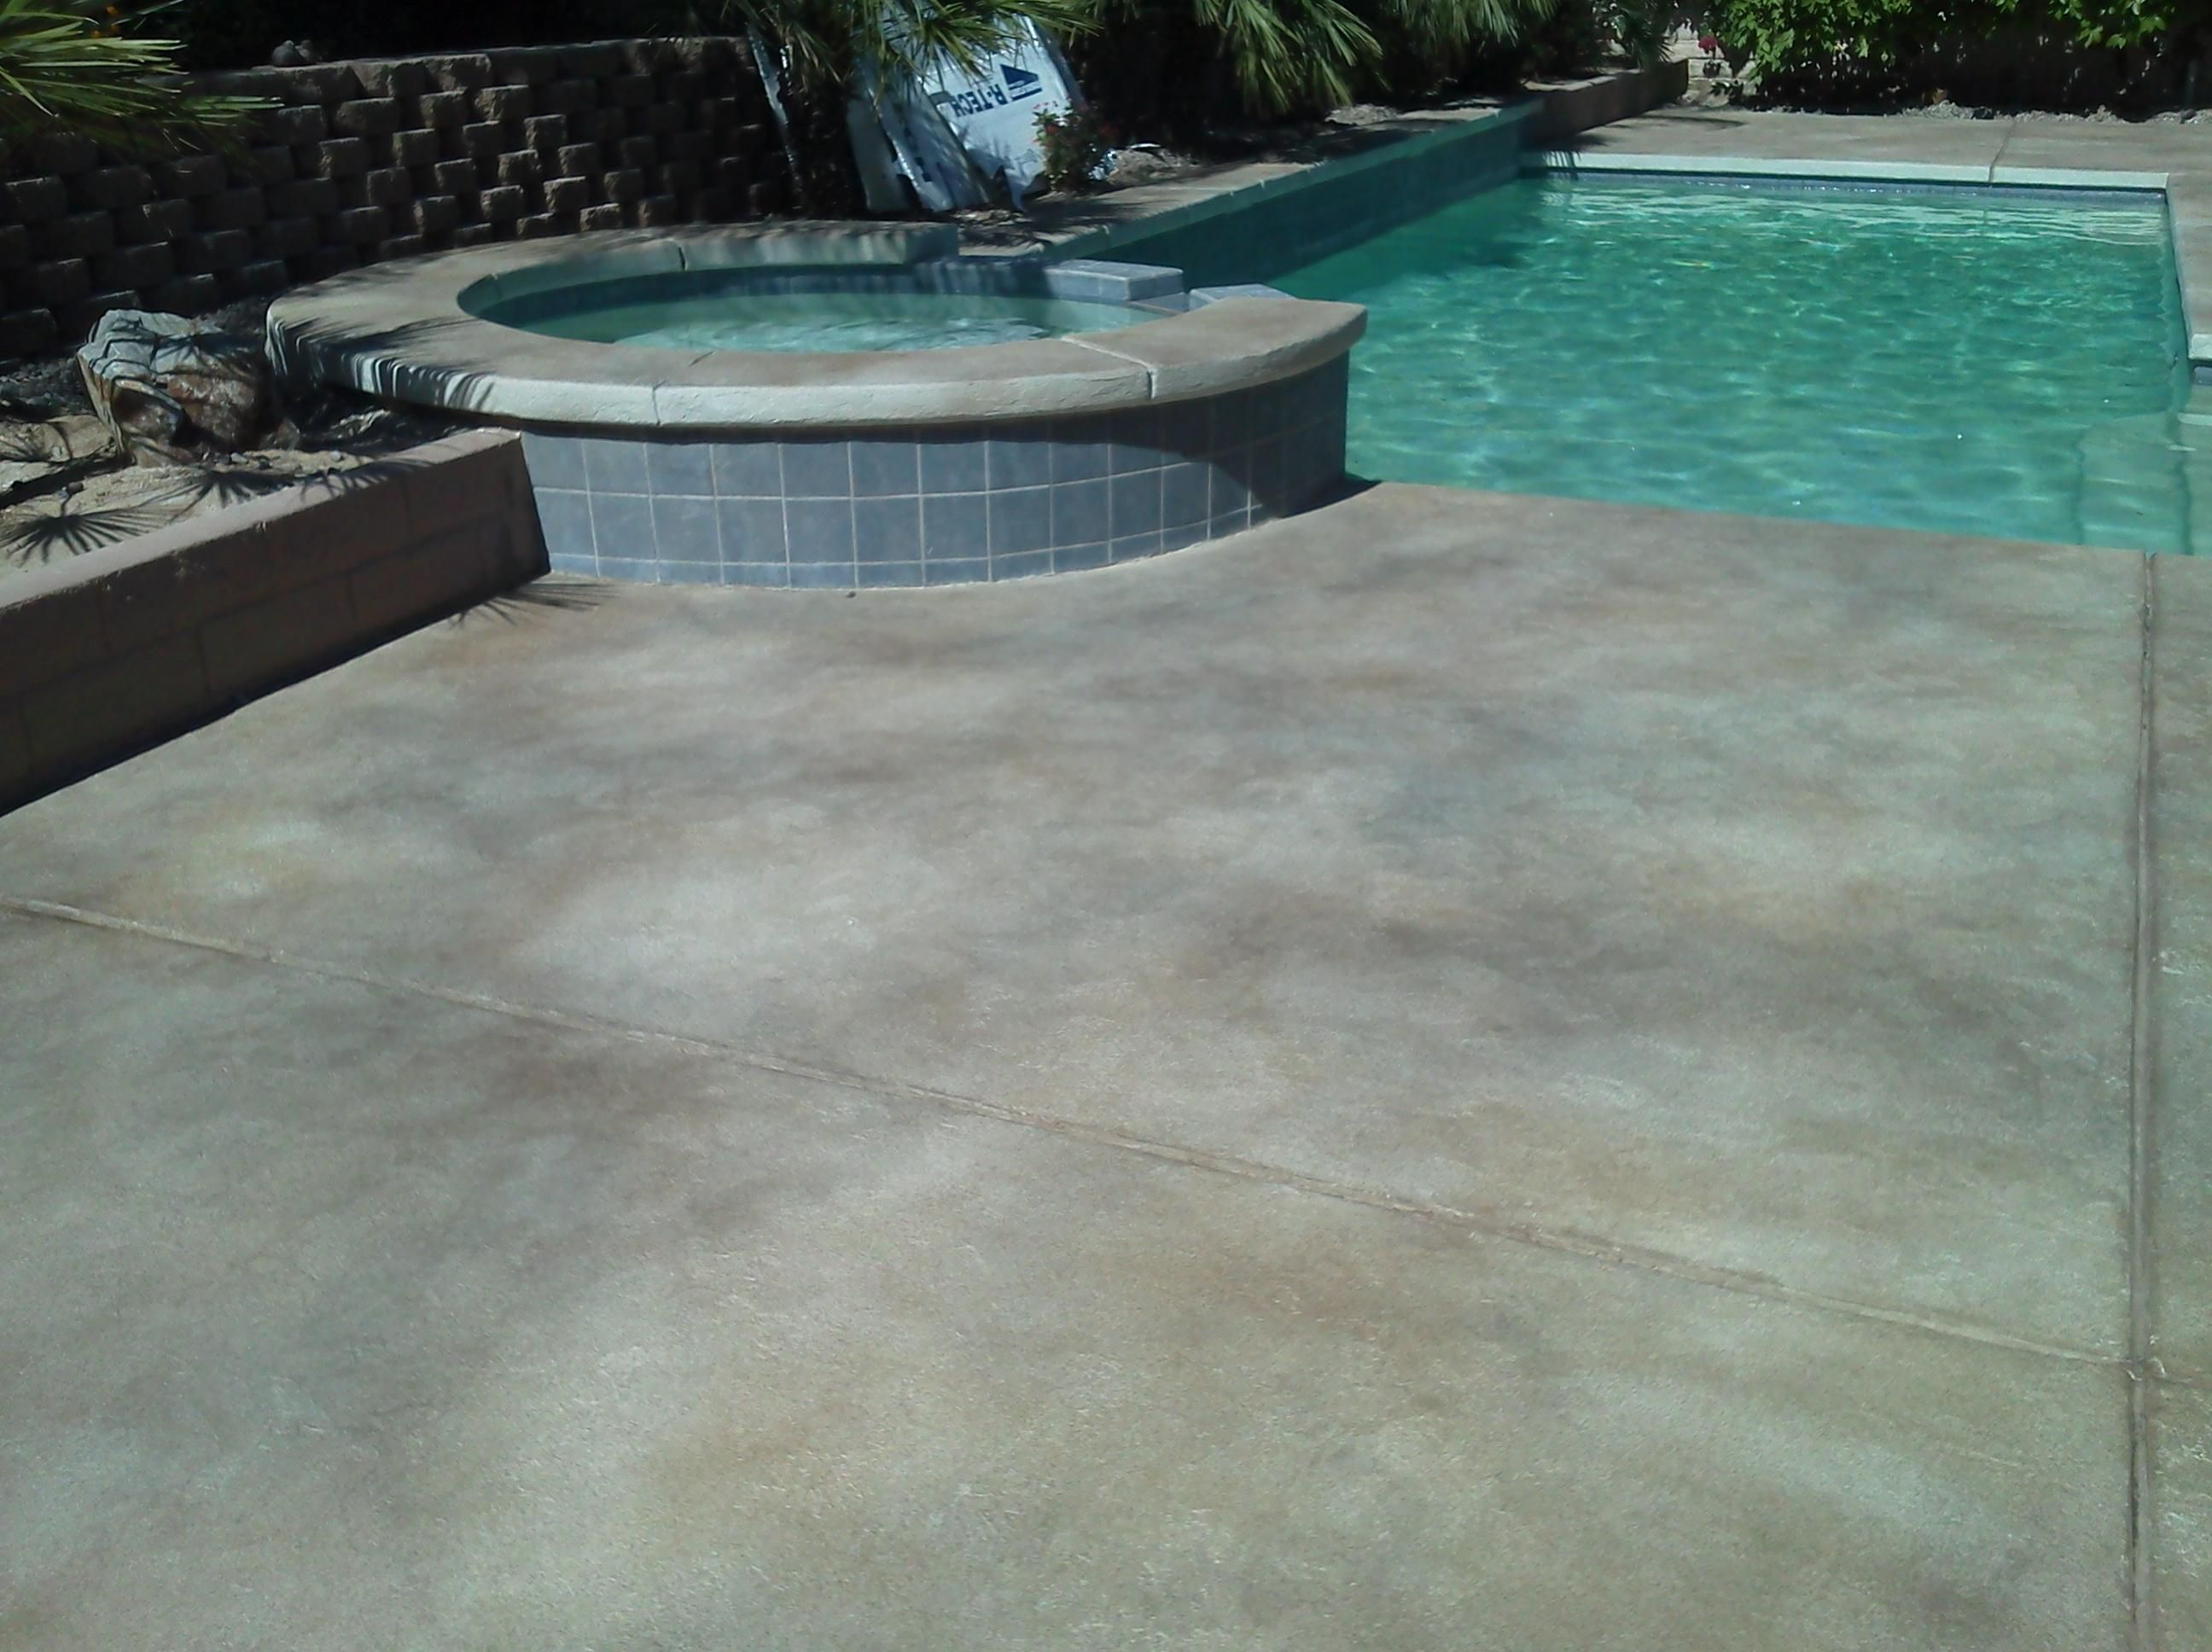 Westcoat Texture Crete Pool Deck In Palm Springs California